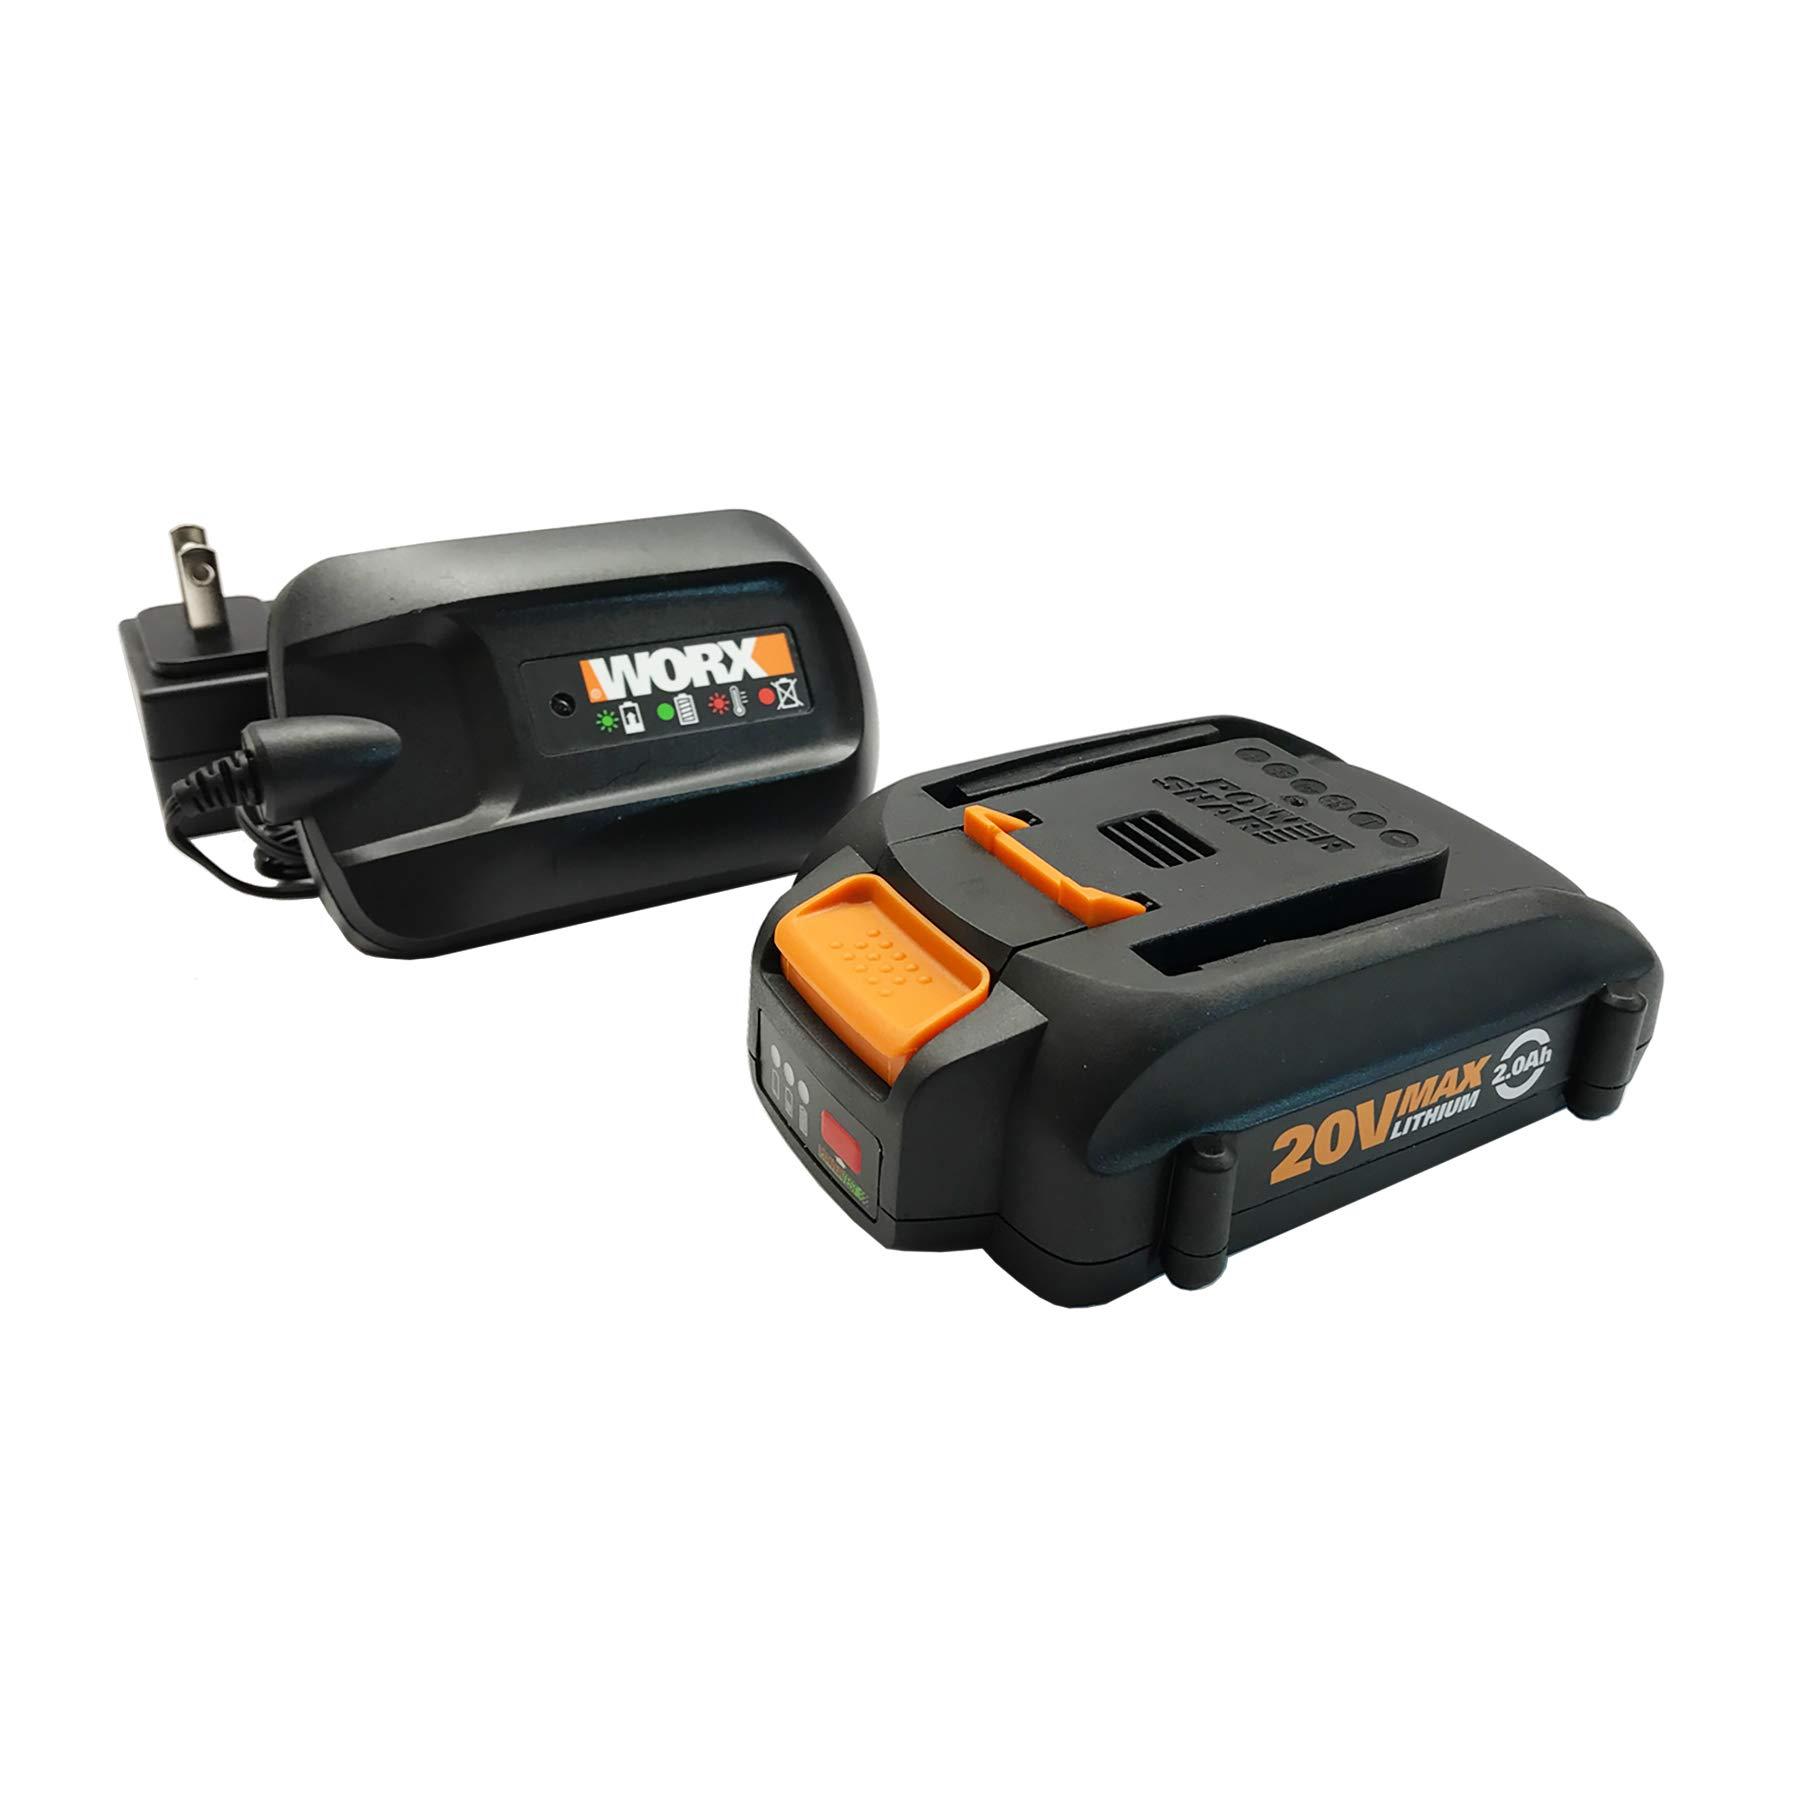 WORX WA3606, 2.0Ah, Indicator, 5 hr Charging Time 20V Battery and Charger, Black & Orange